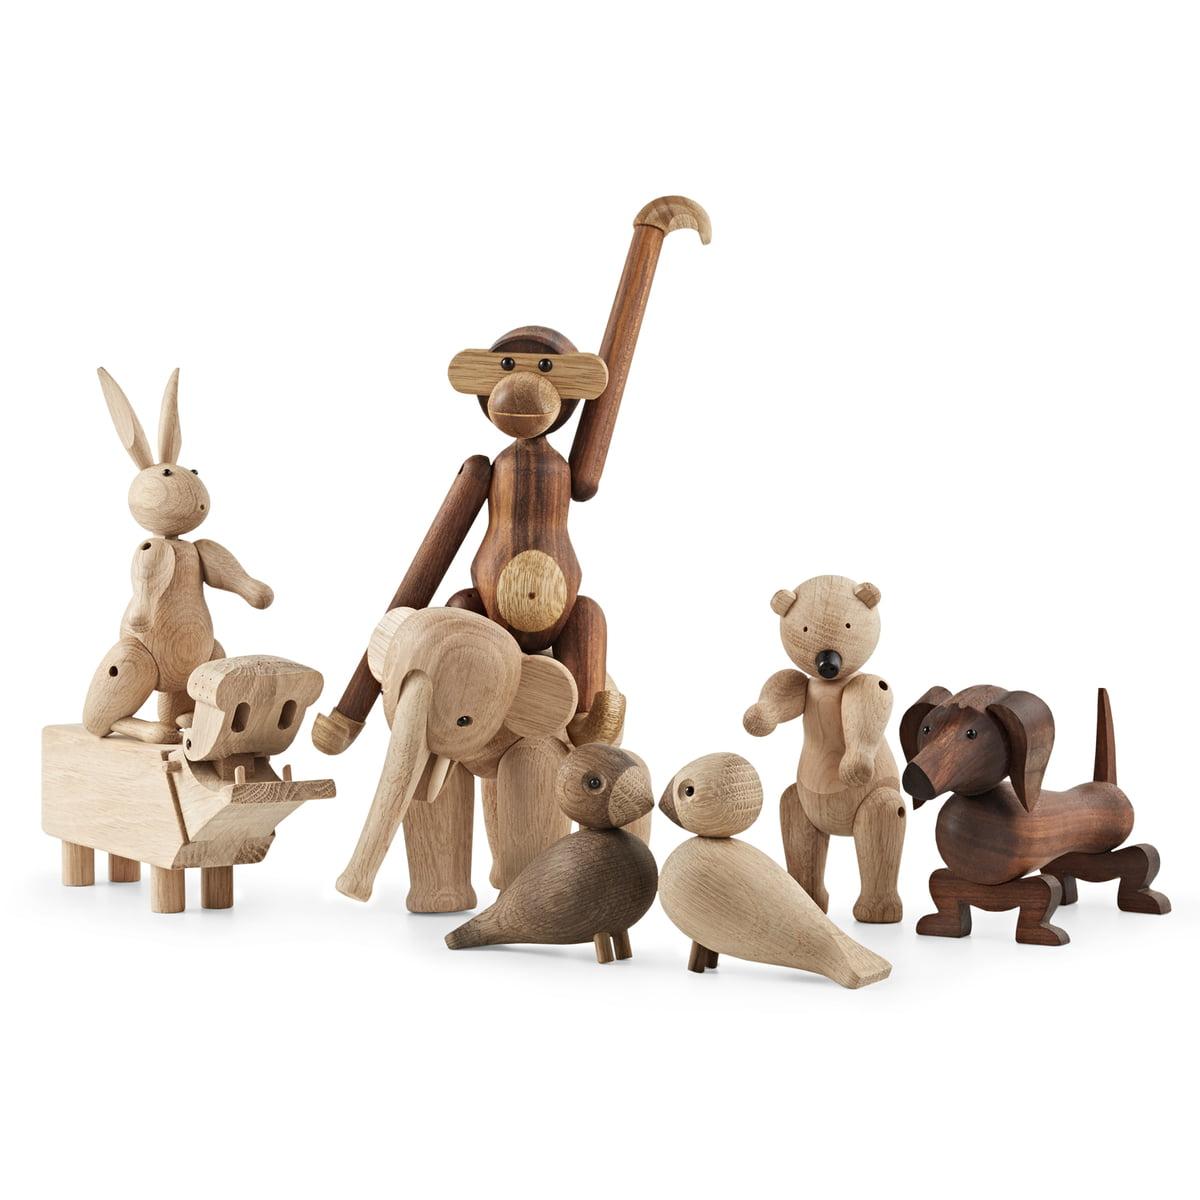 Fremragende Kay Bojesen Wooden Monkey   Connox Shop EM72